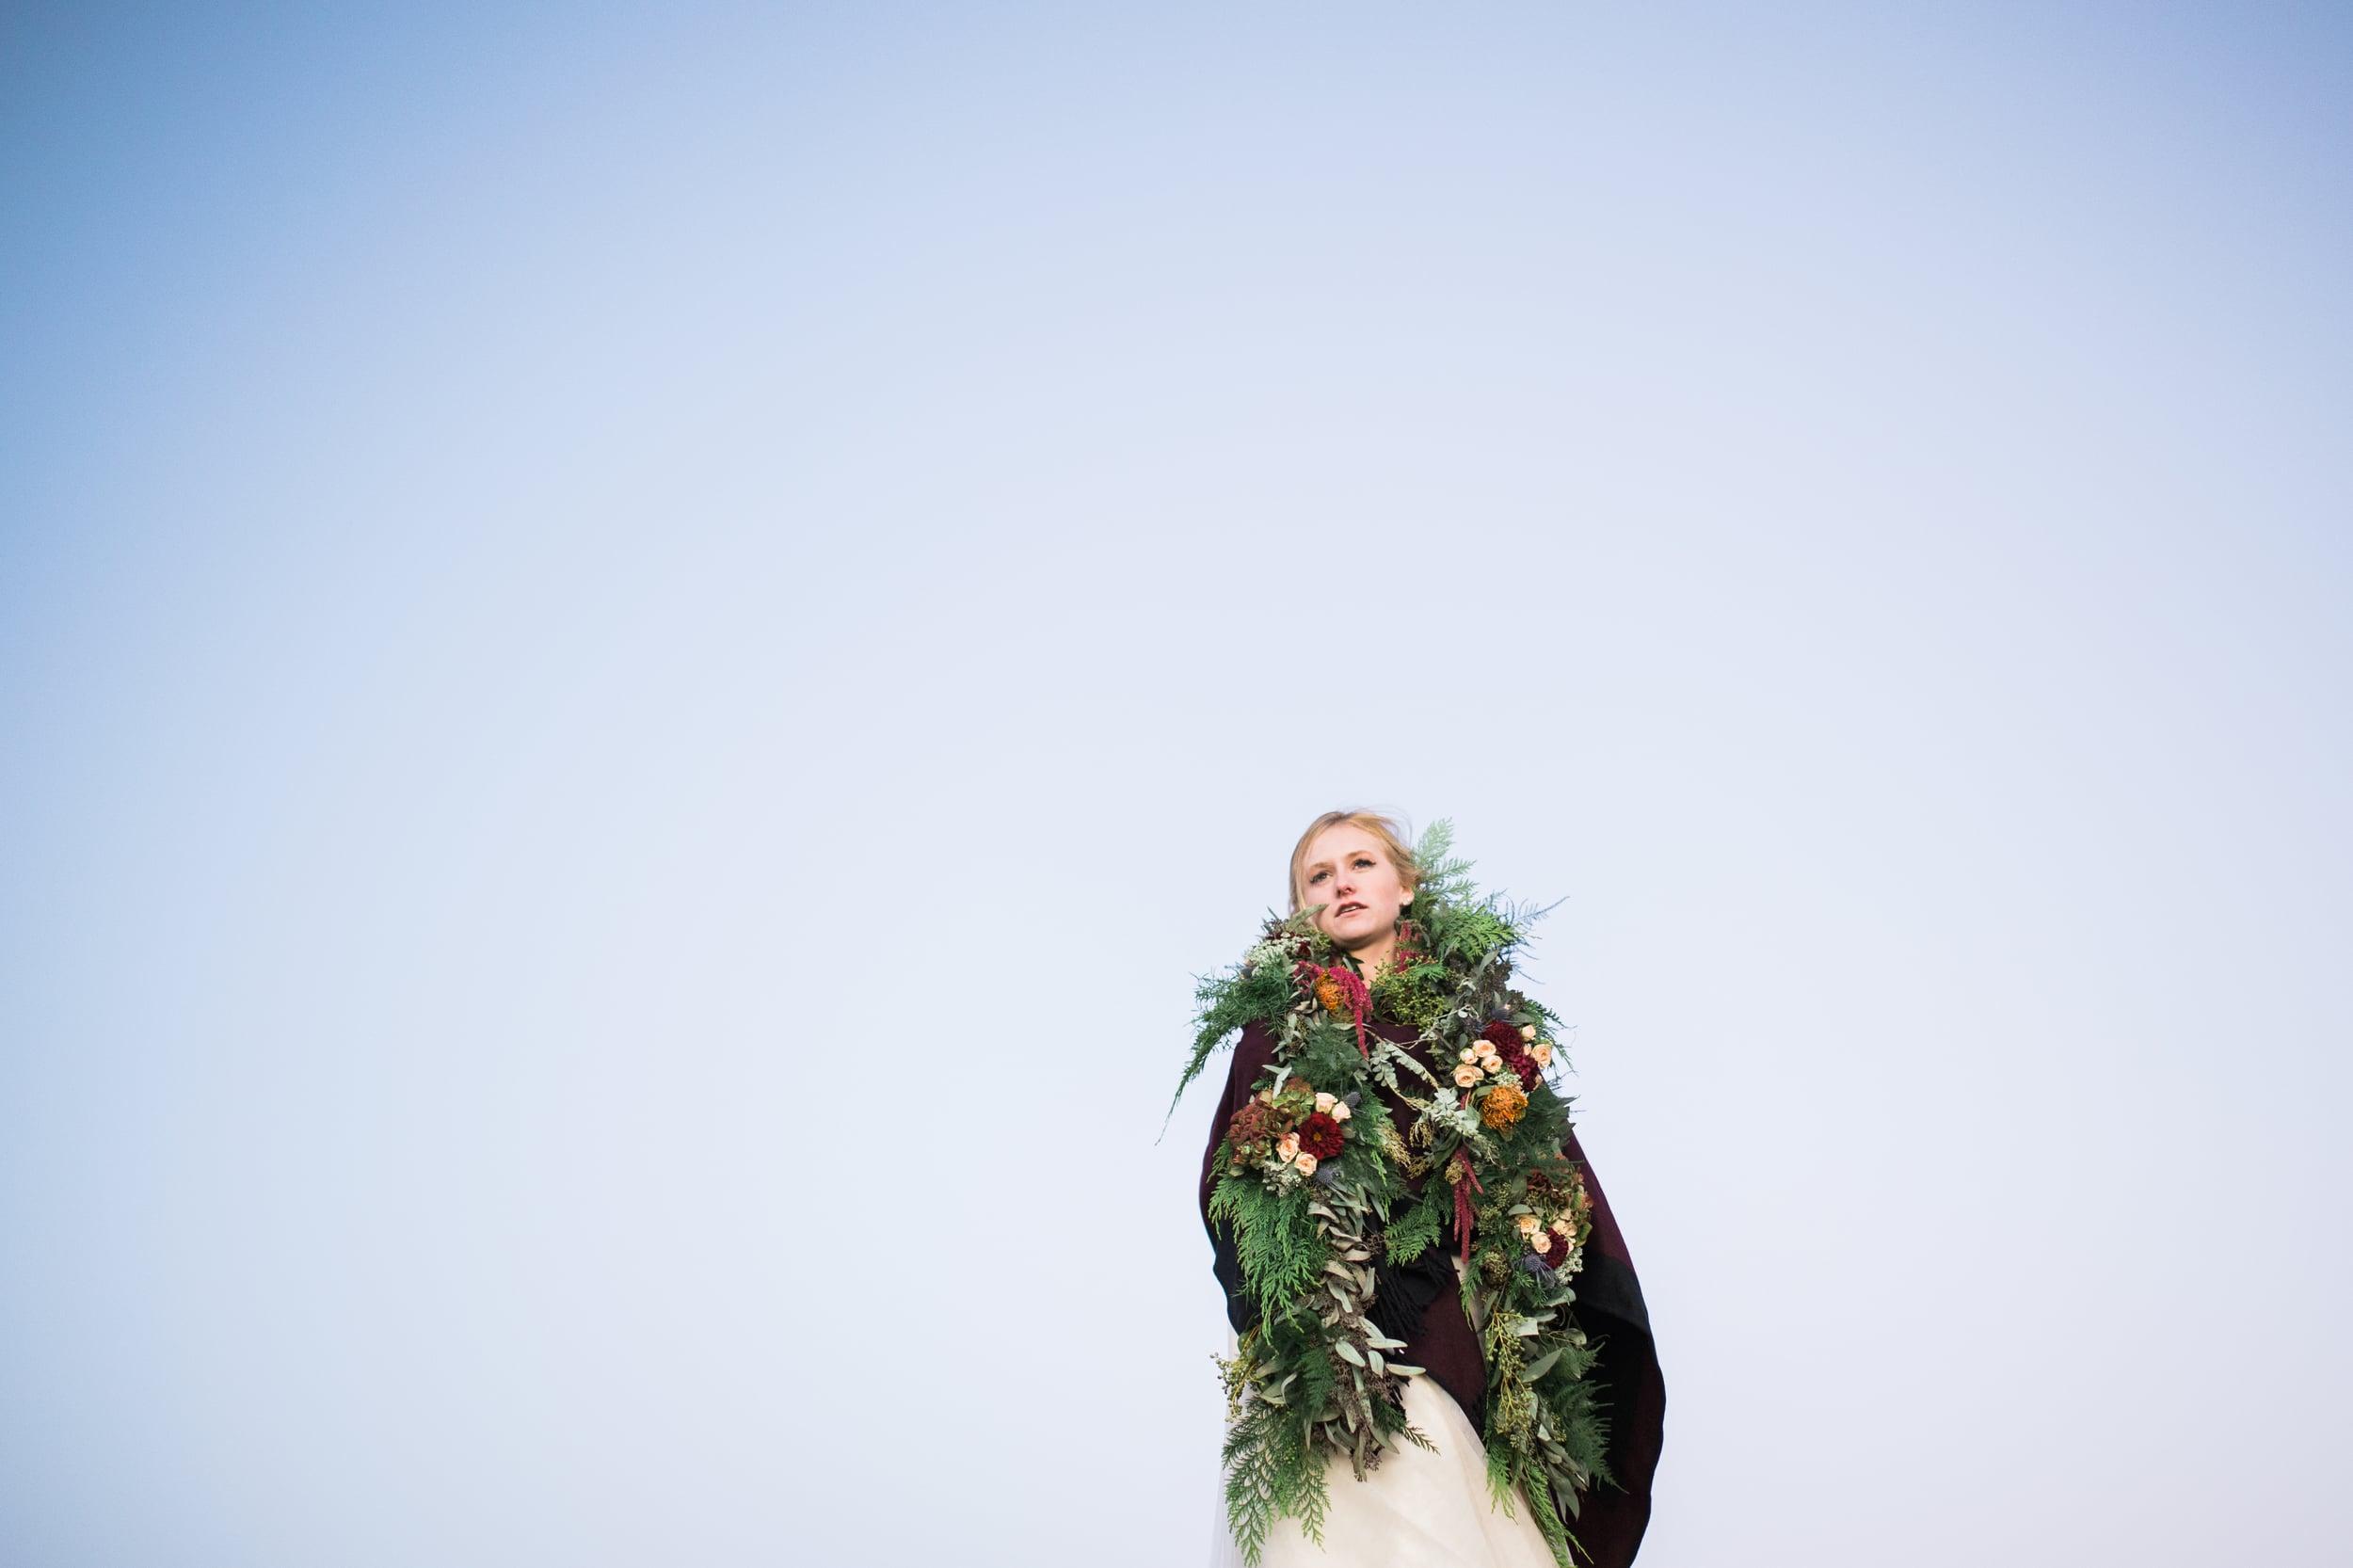 Colorado Mountain Wedding Photographer - bridal flower garland